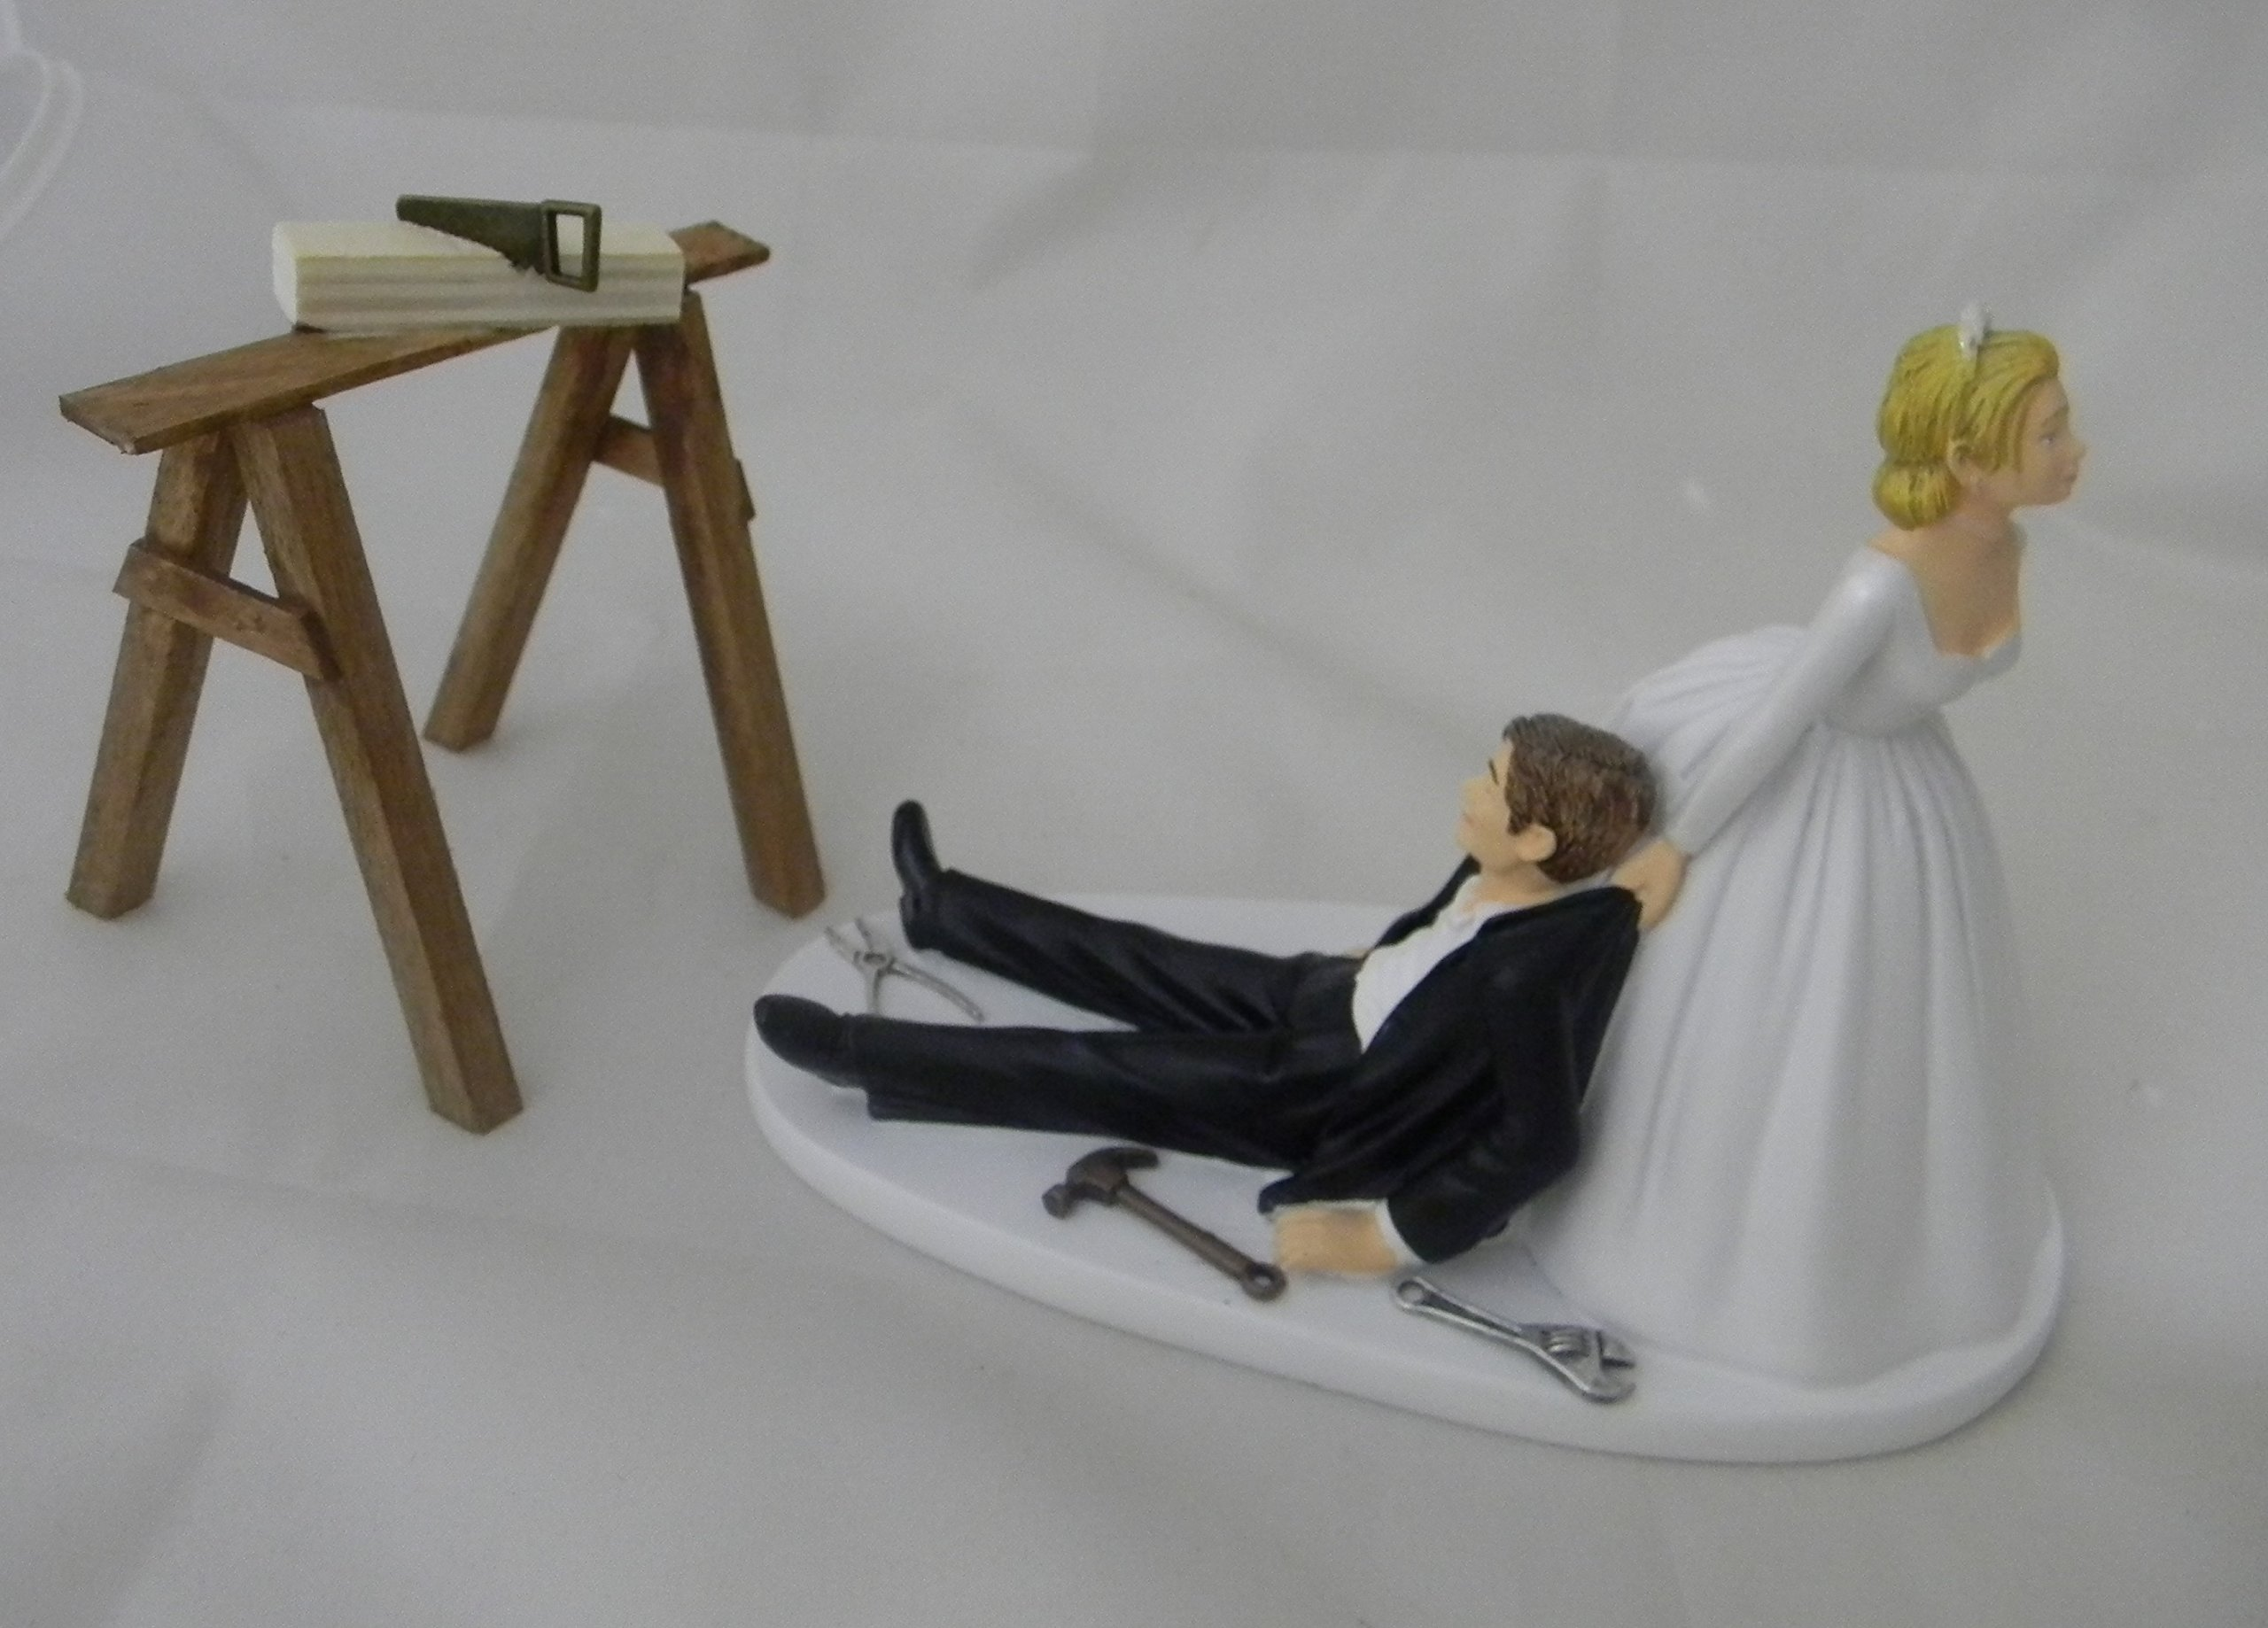 Wedding Reception Party Shop Garage Saw Horse Tools Carpenter Cake Topper